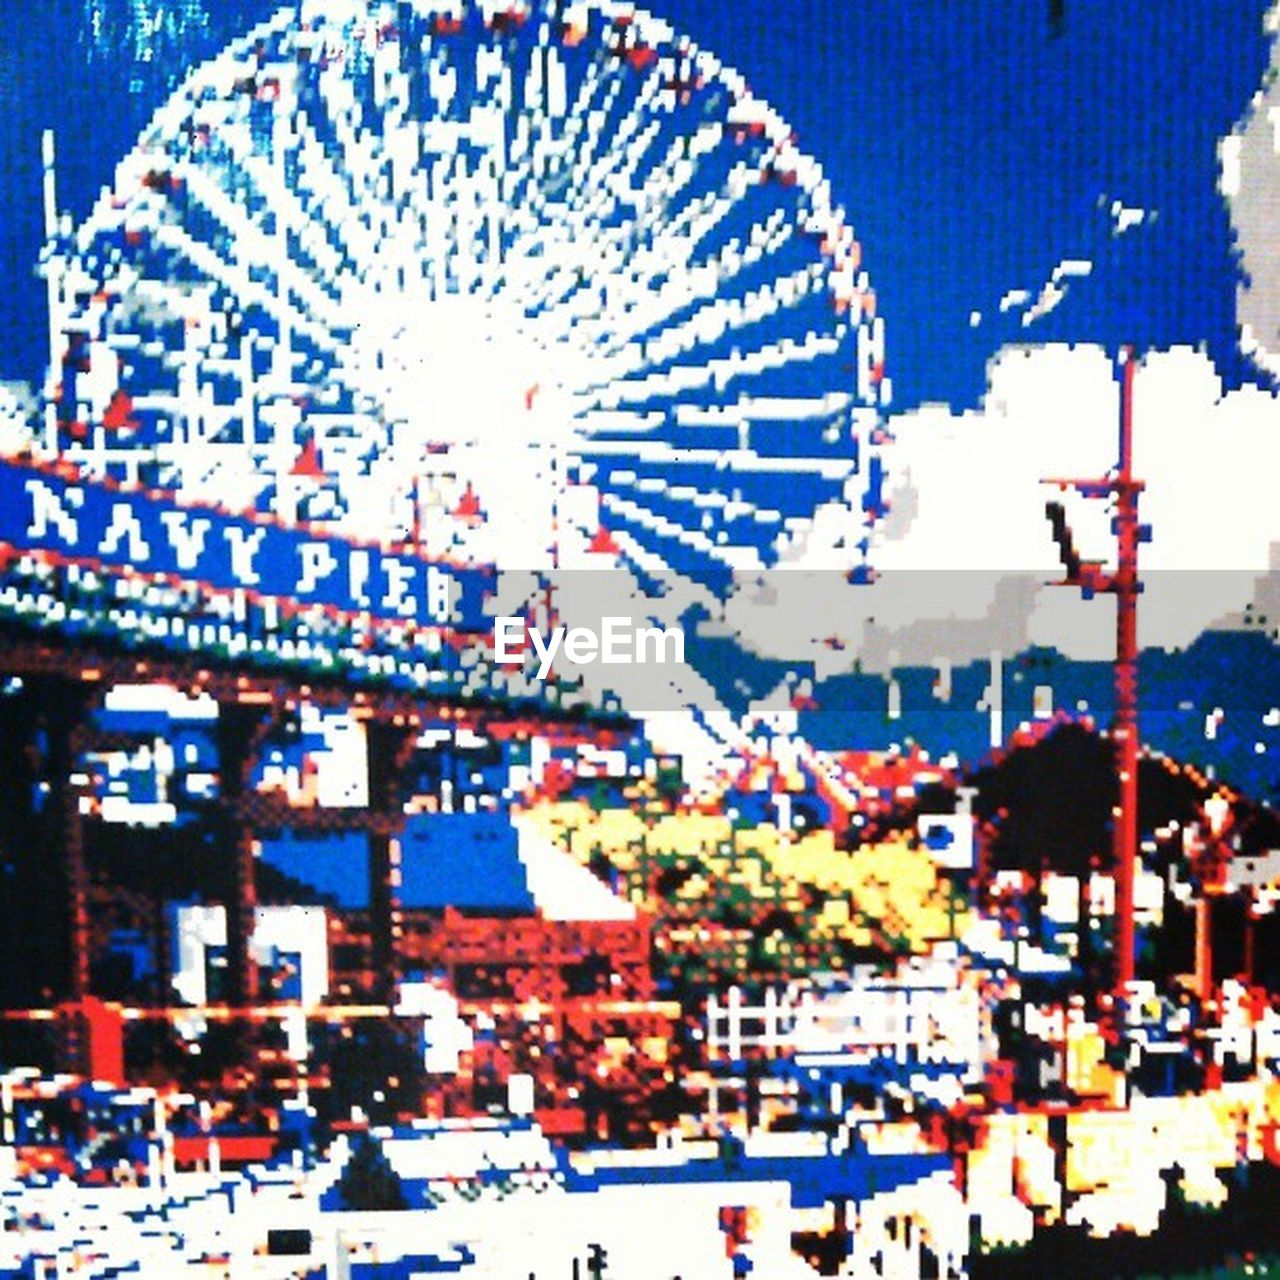 arts culture and entertainment, amusement park, ferris wheel, amusement park ride, blue, illuminated, clear sky, cityscape, night, outdoors, no people, city, sky